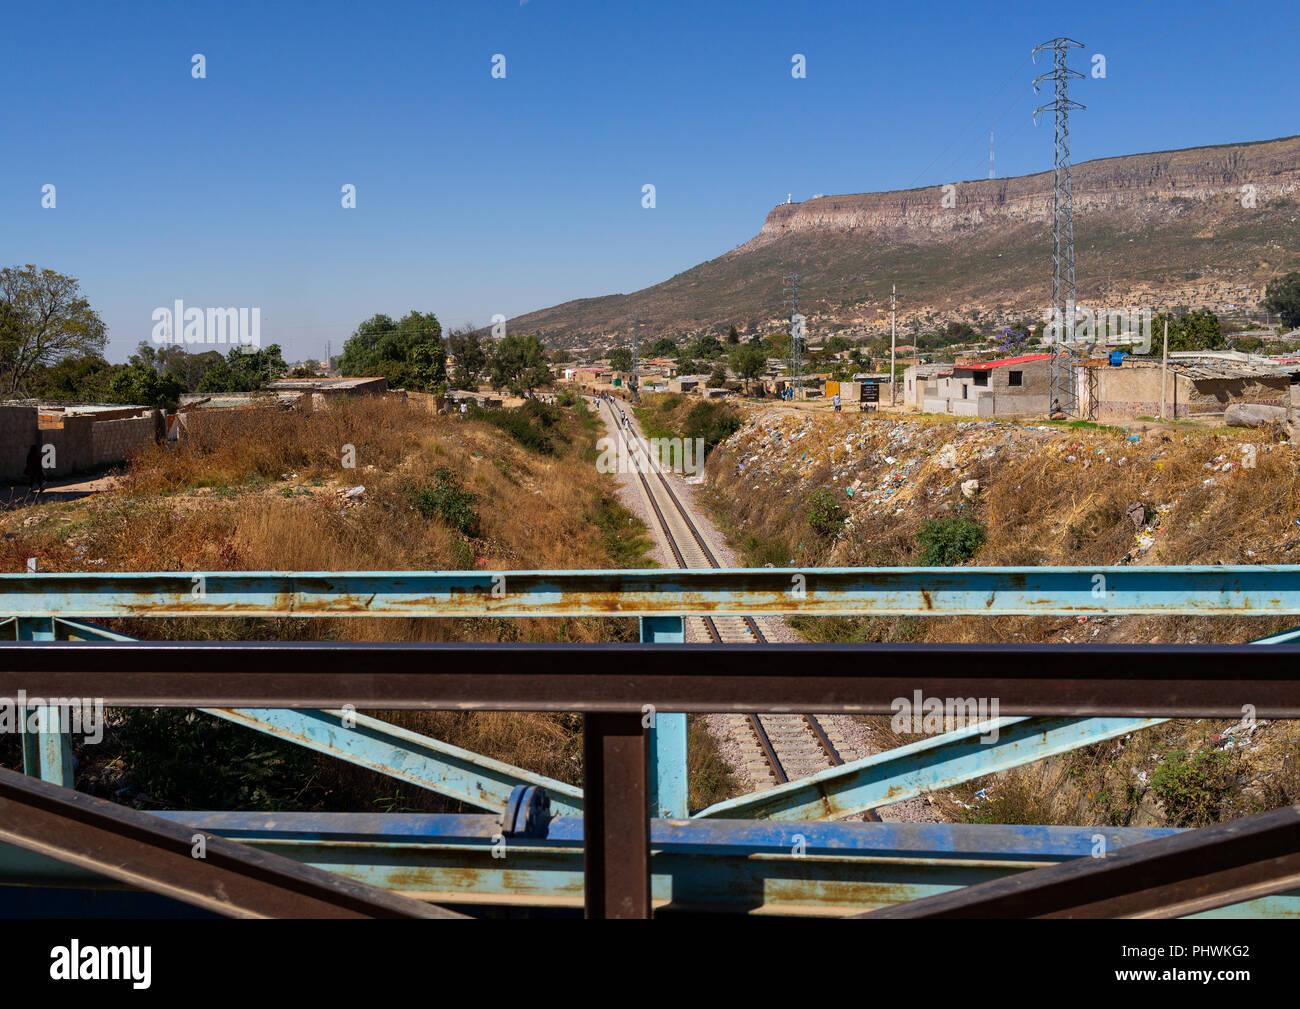 Railroad track, Huila Province, Lubango, Angola - Stock Image